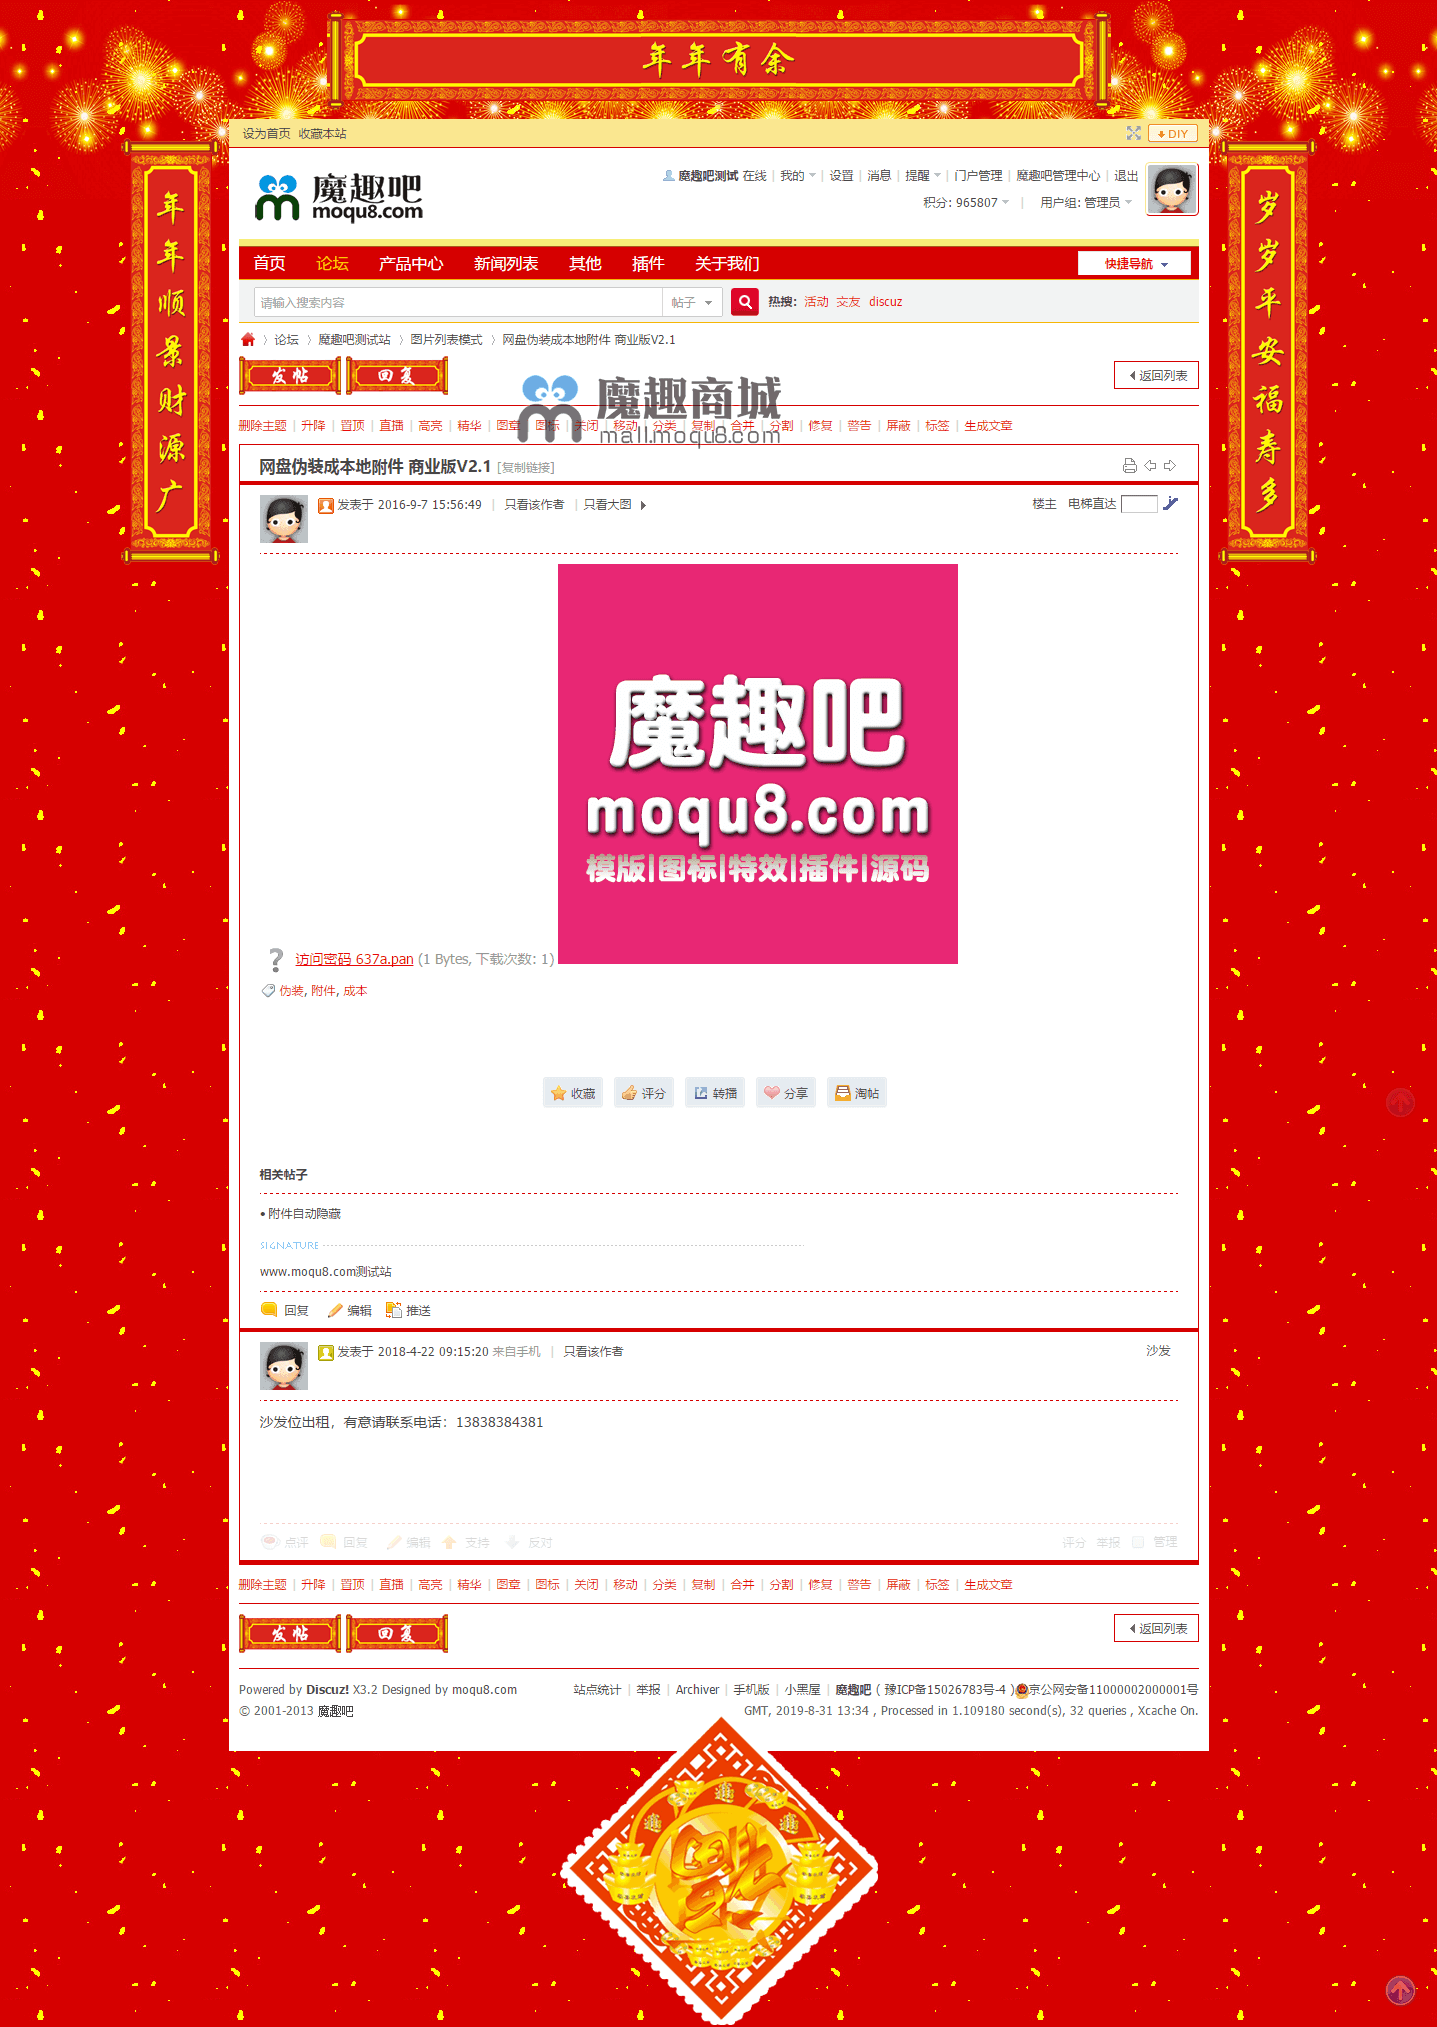 <font color='#ff0000'>魔趣红色喜庆春节特别论坛模板</font>